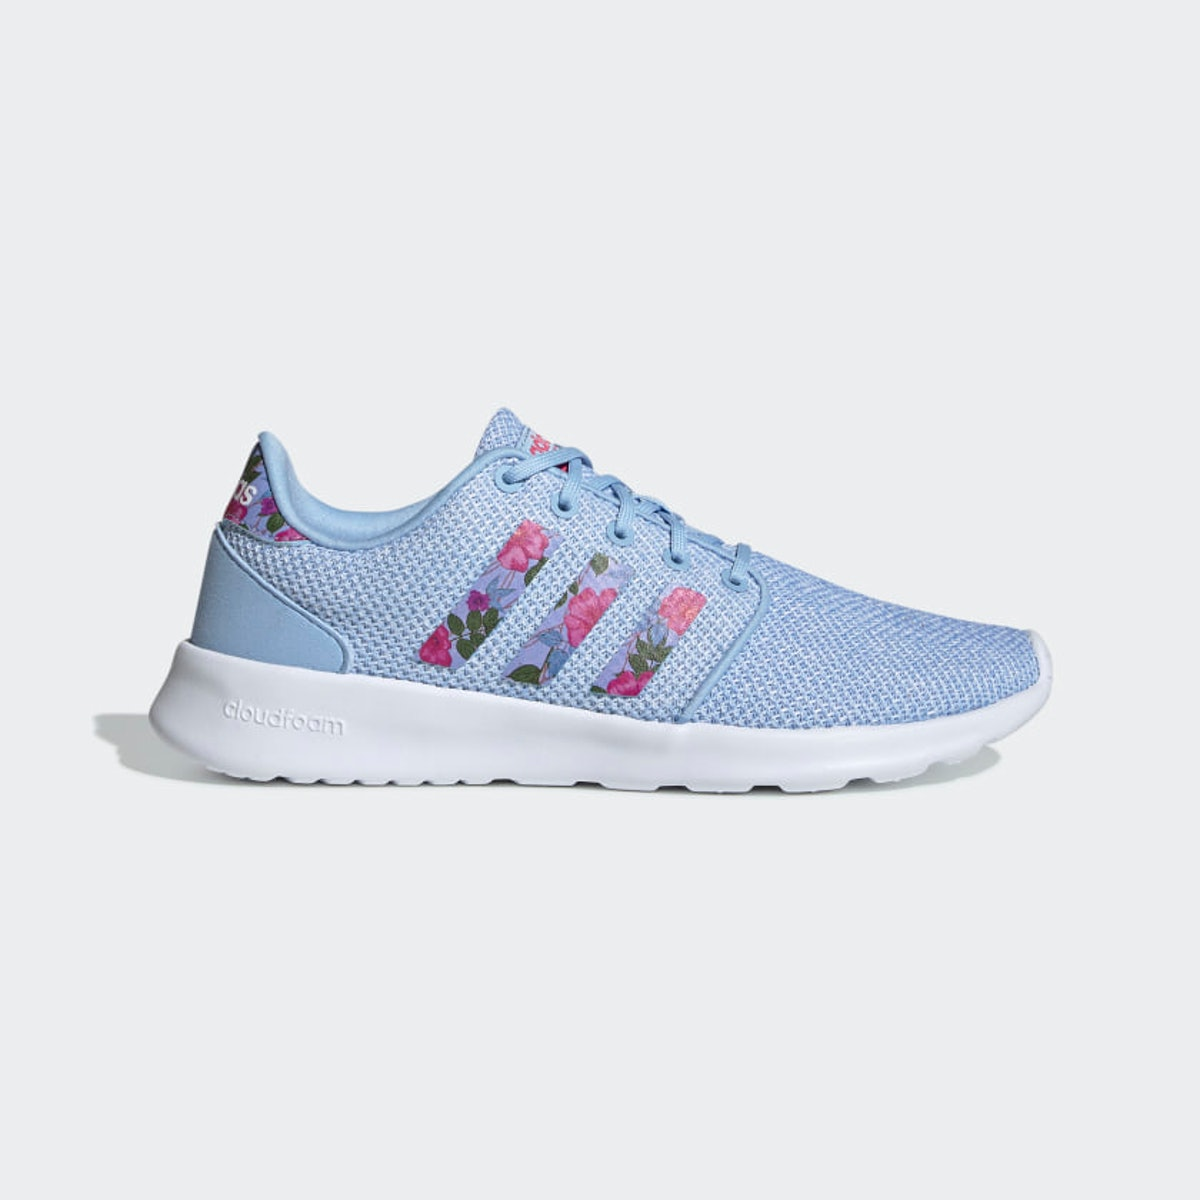 "QT Racer Shoes in ""Glow Blue"""